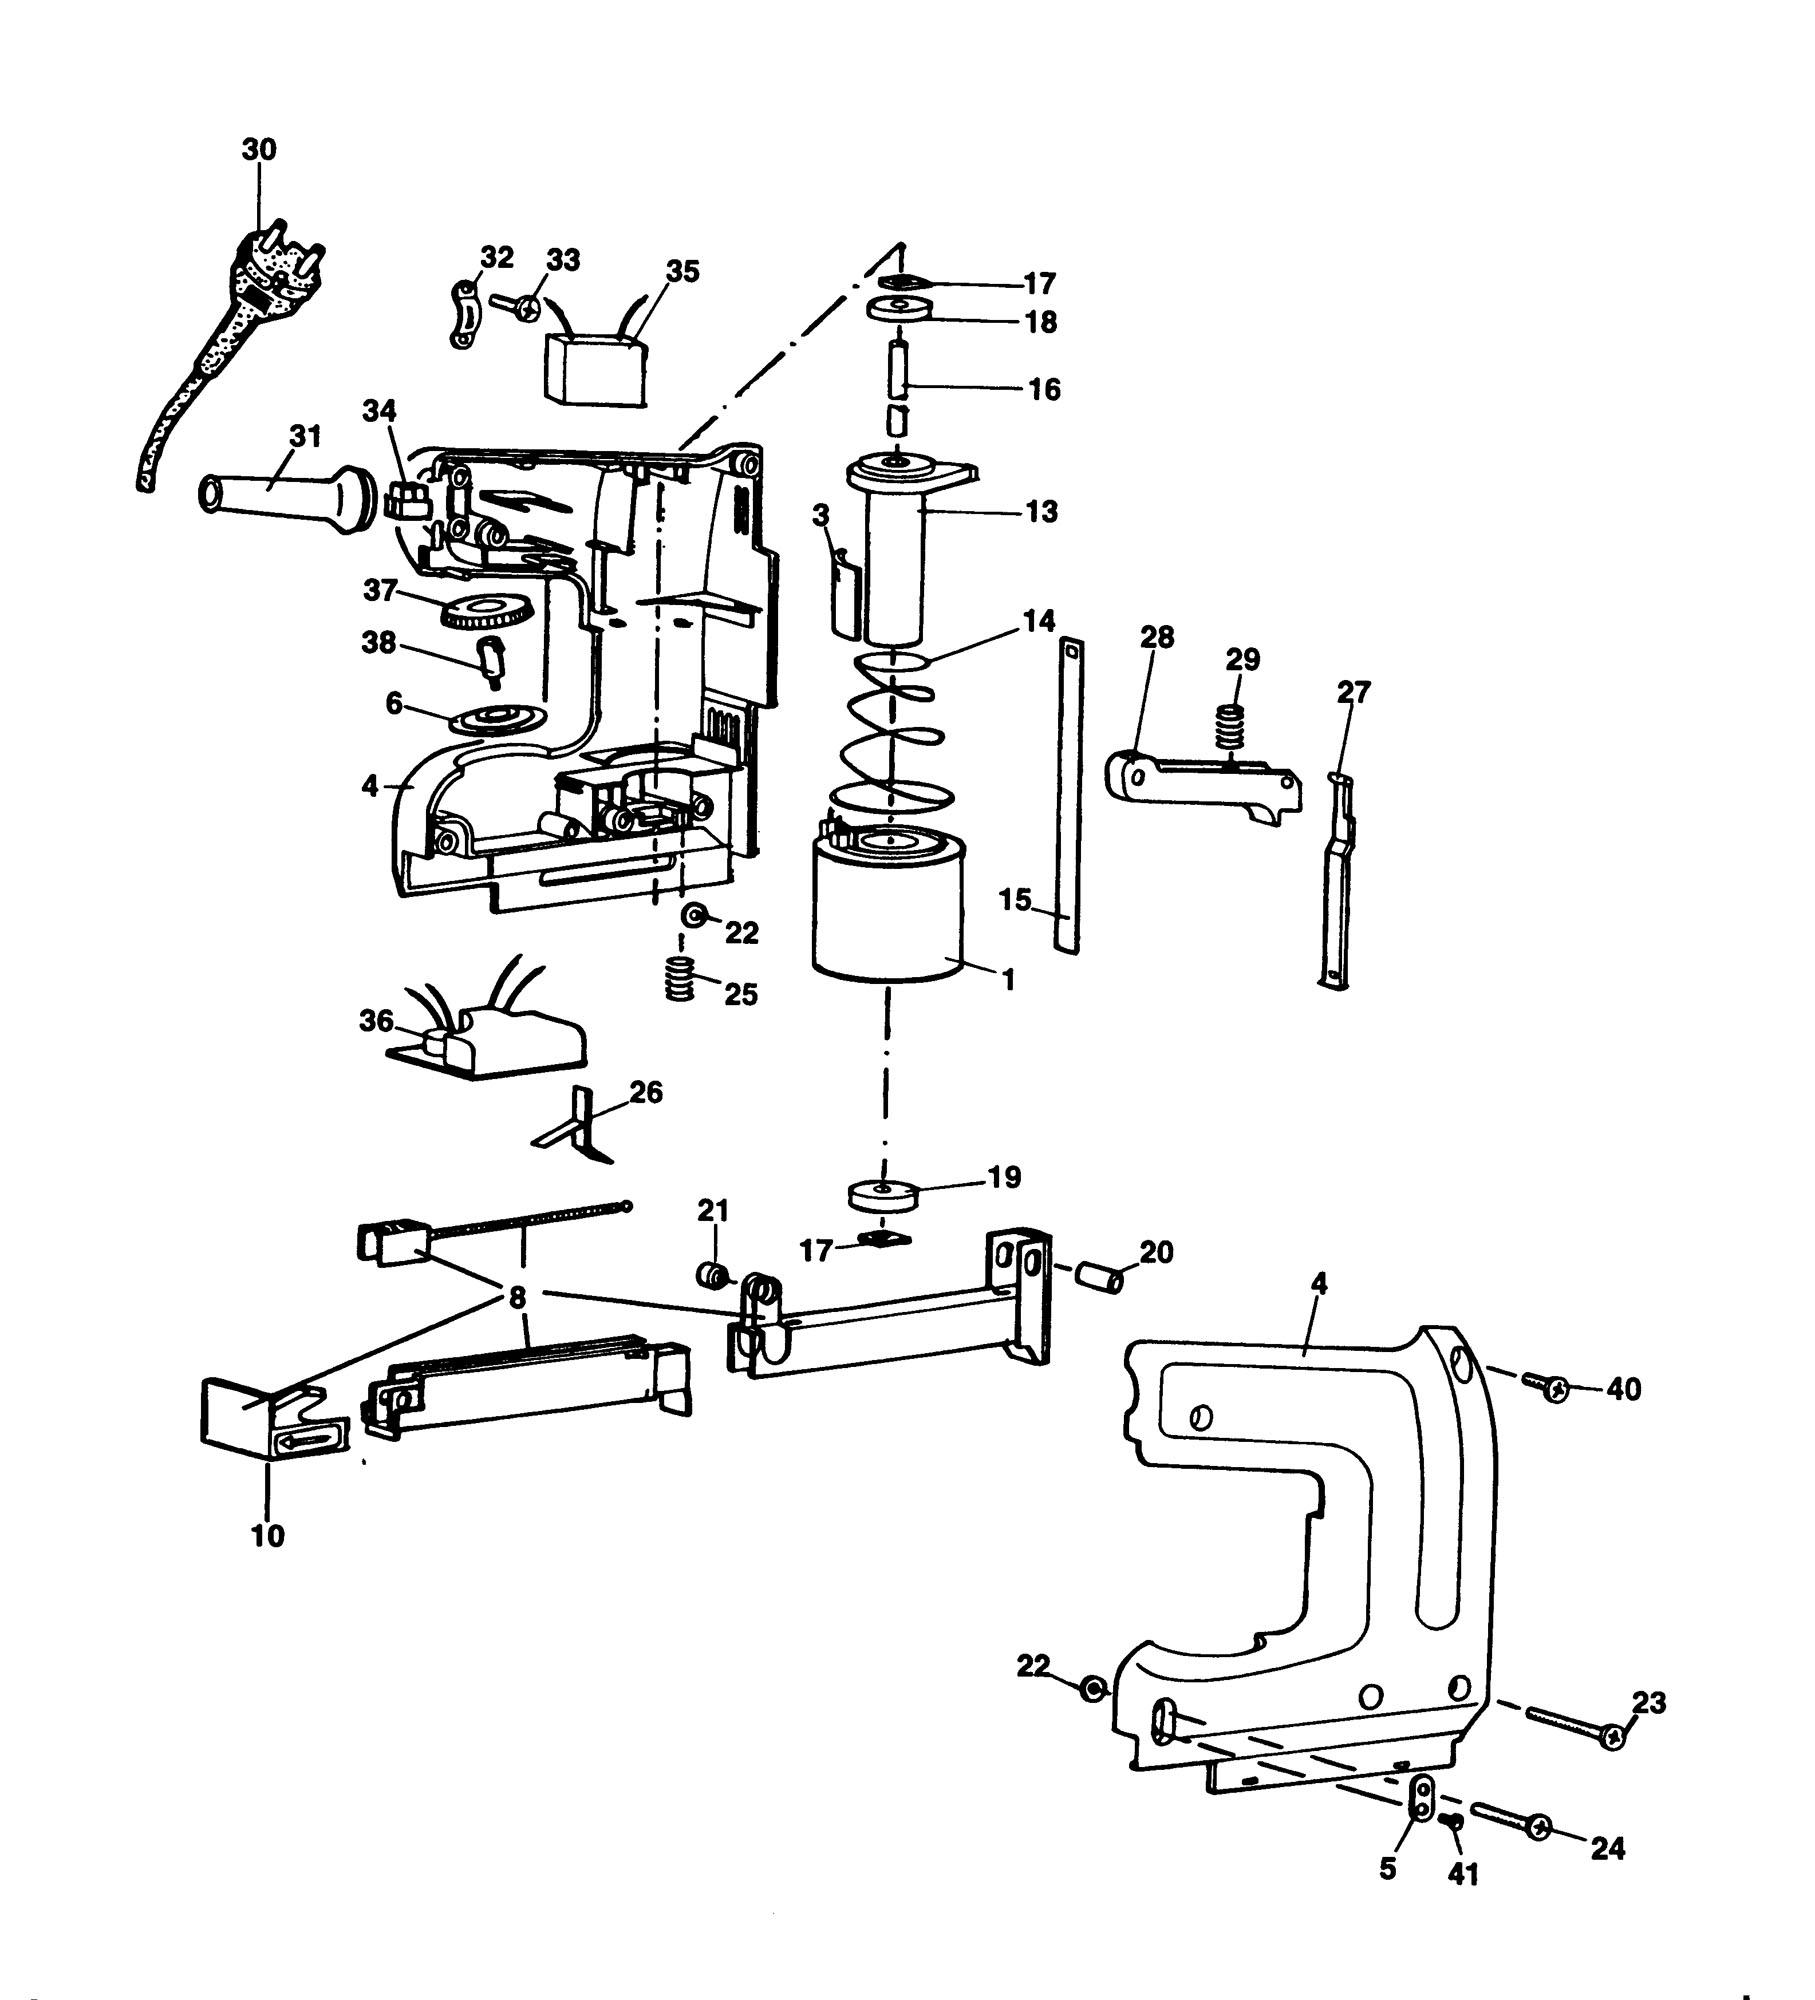 Spares for Black & Decker Bd418 Tacker (type 1) SPARE